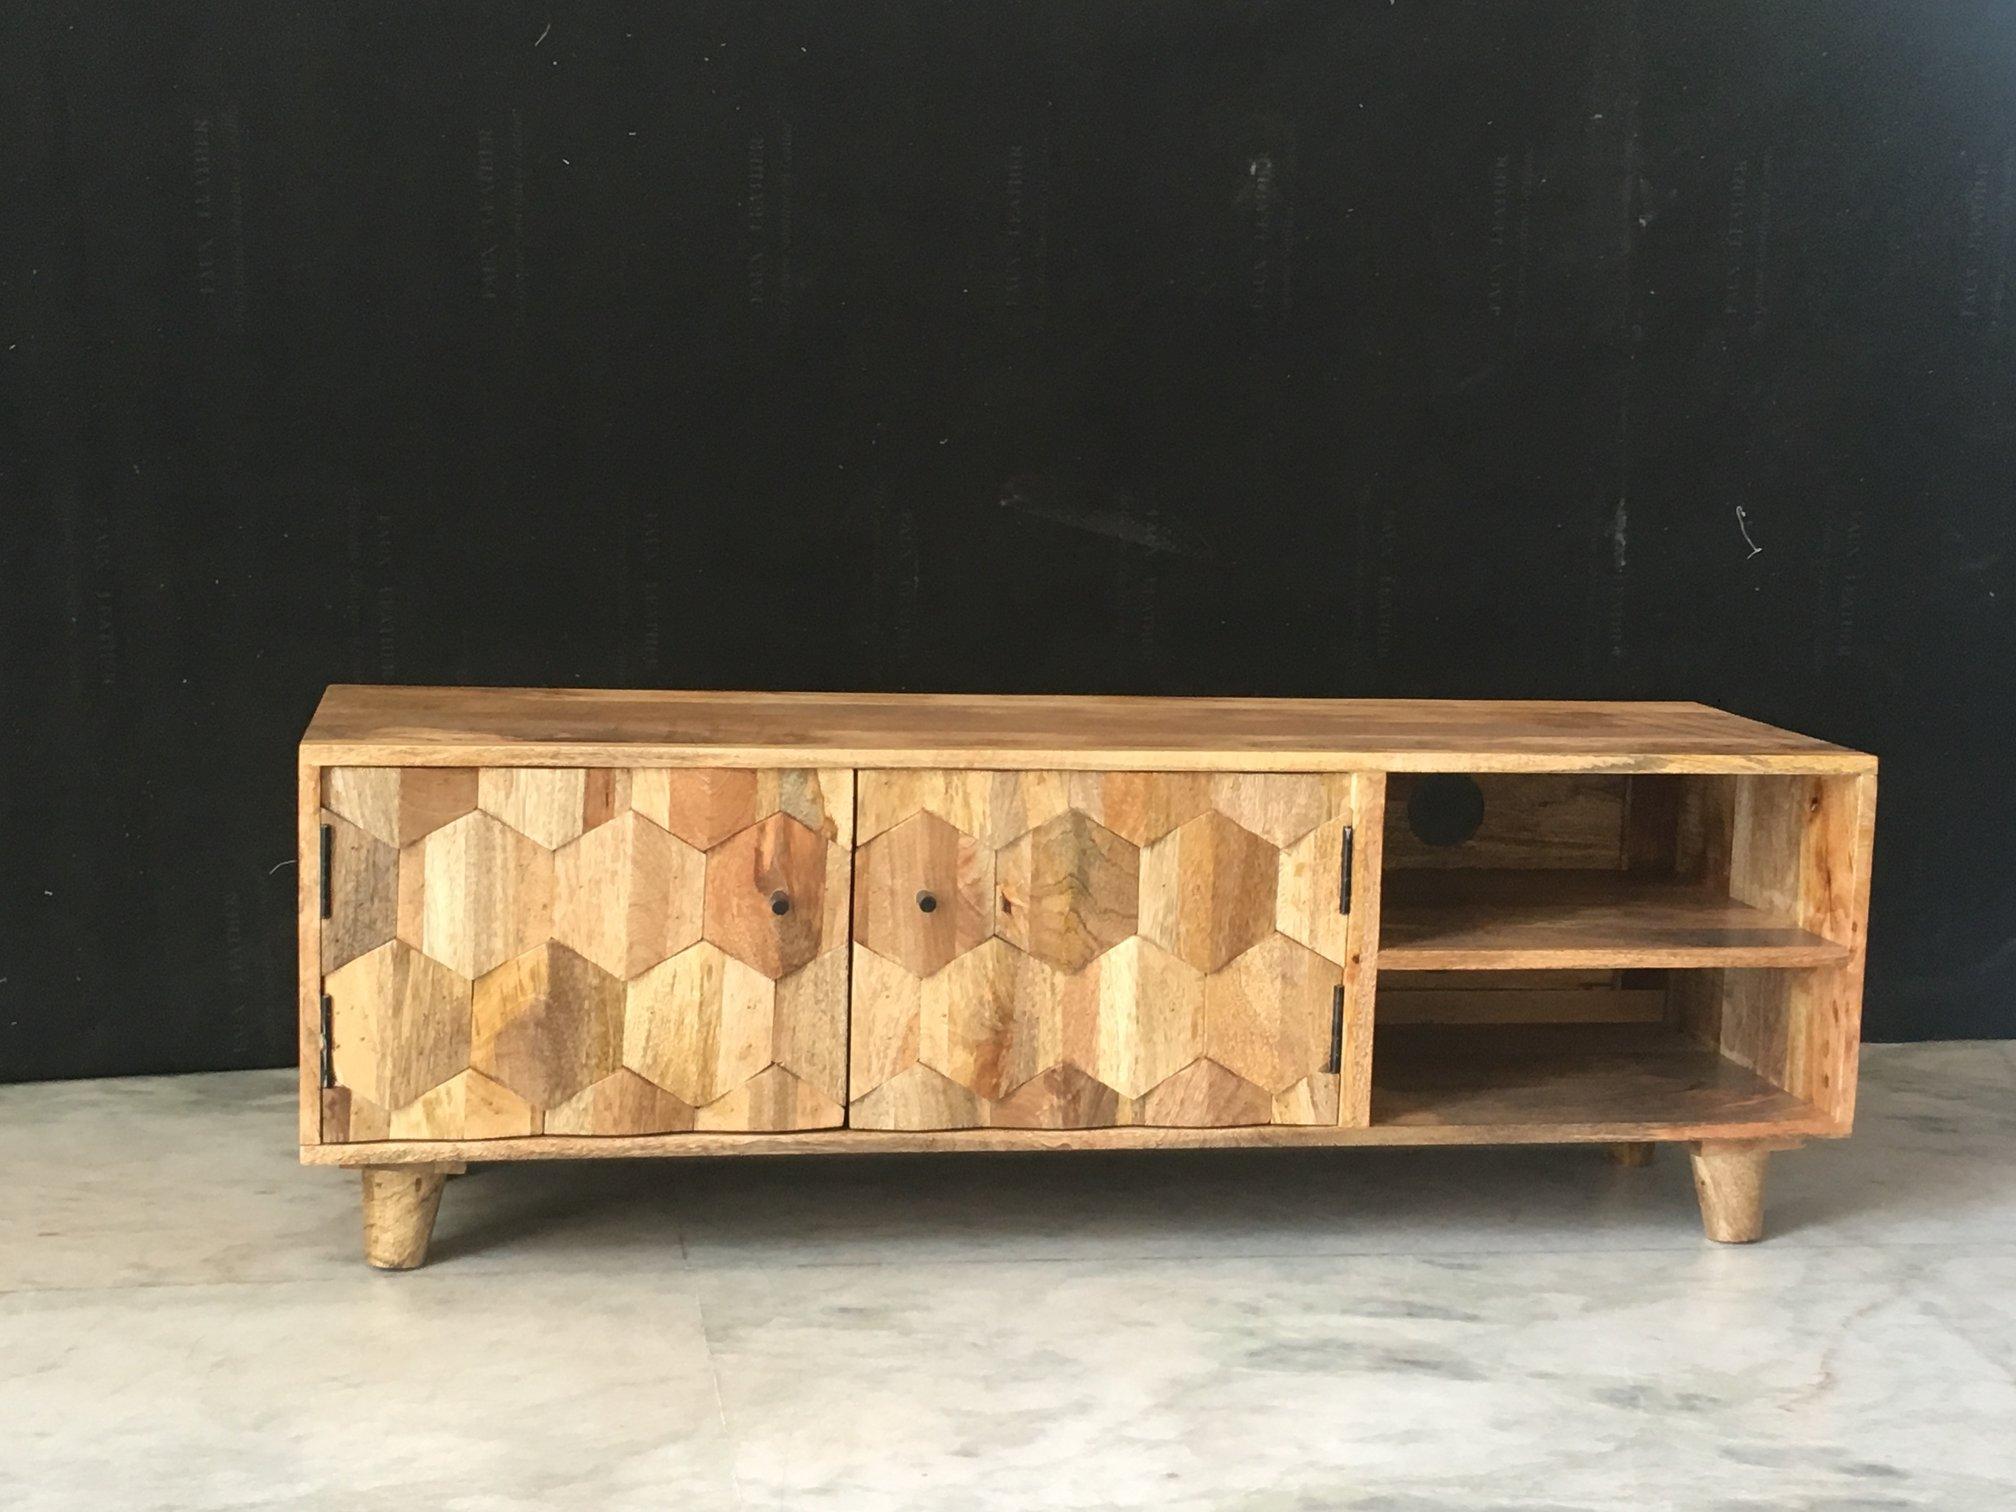 Light Mango Wood Tv Stand Media Unit With Hexagonal Patterns